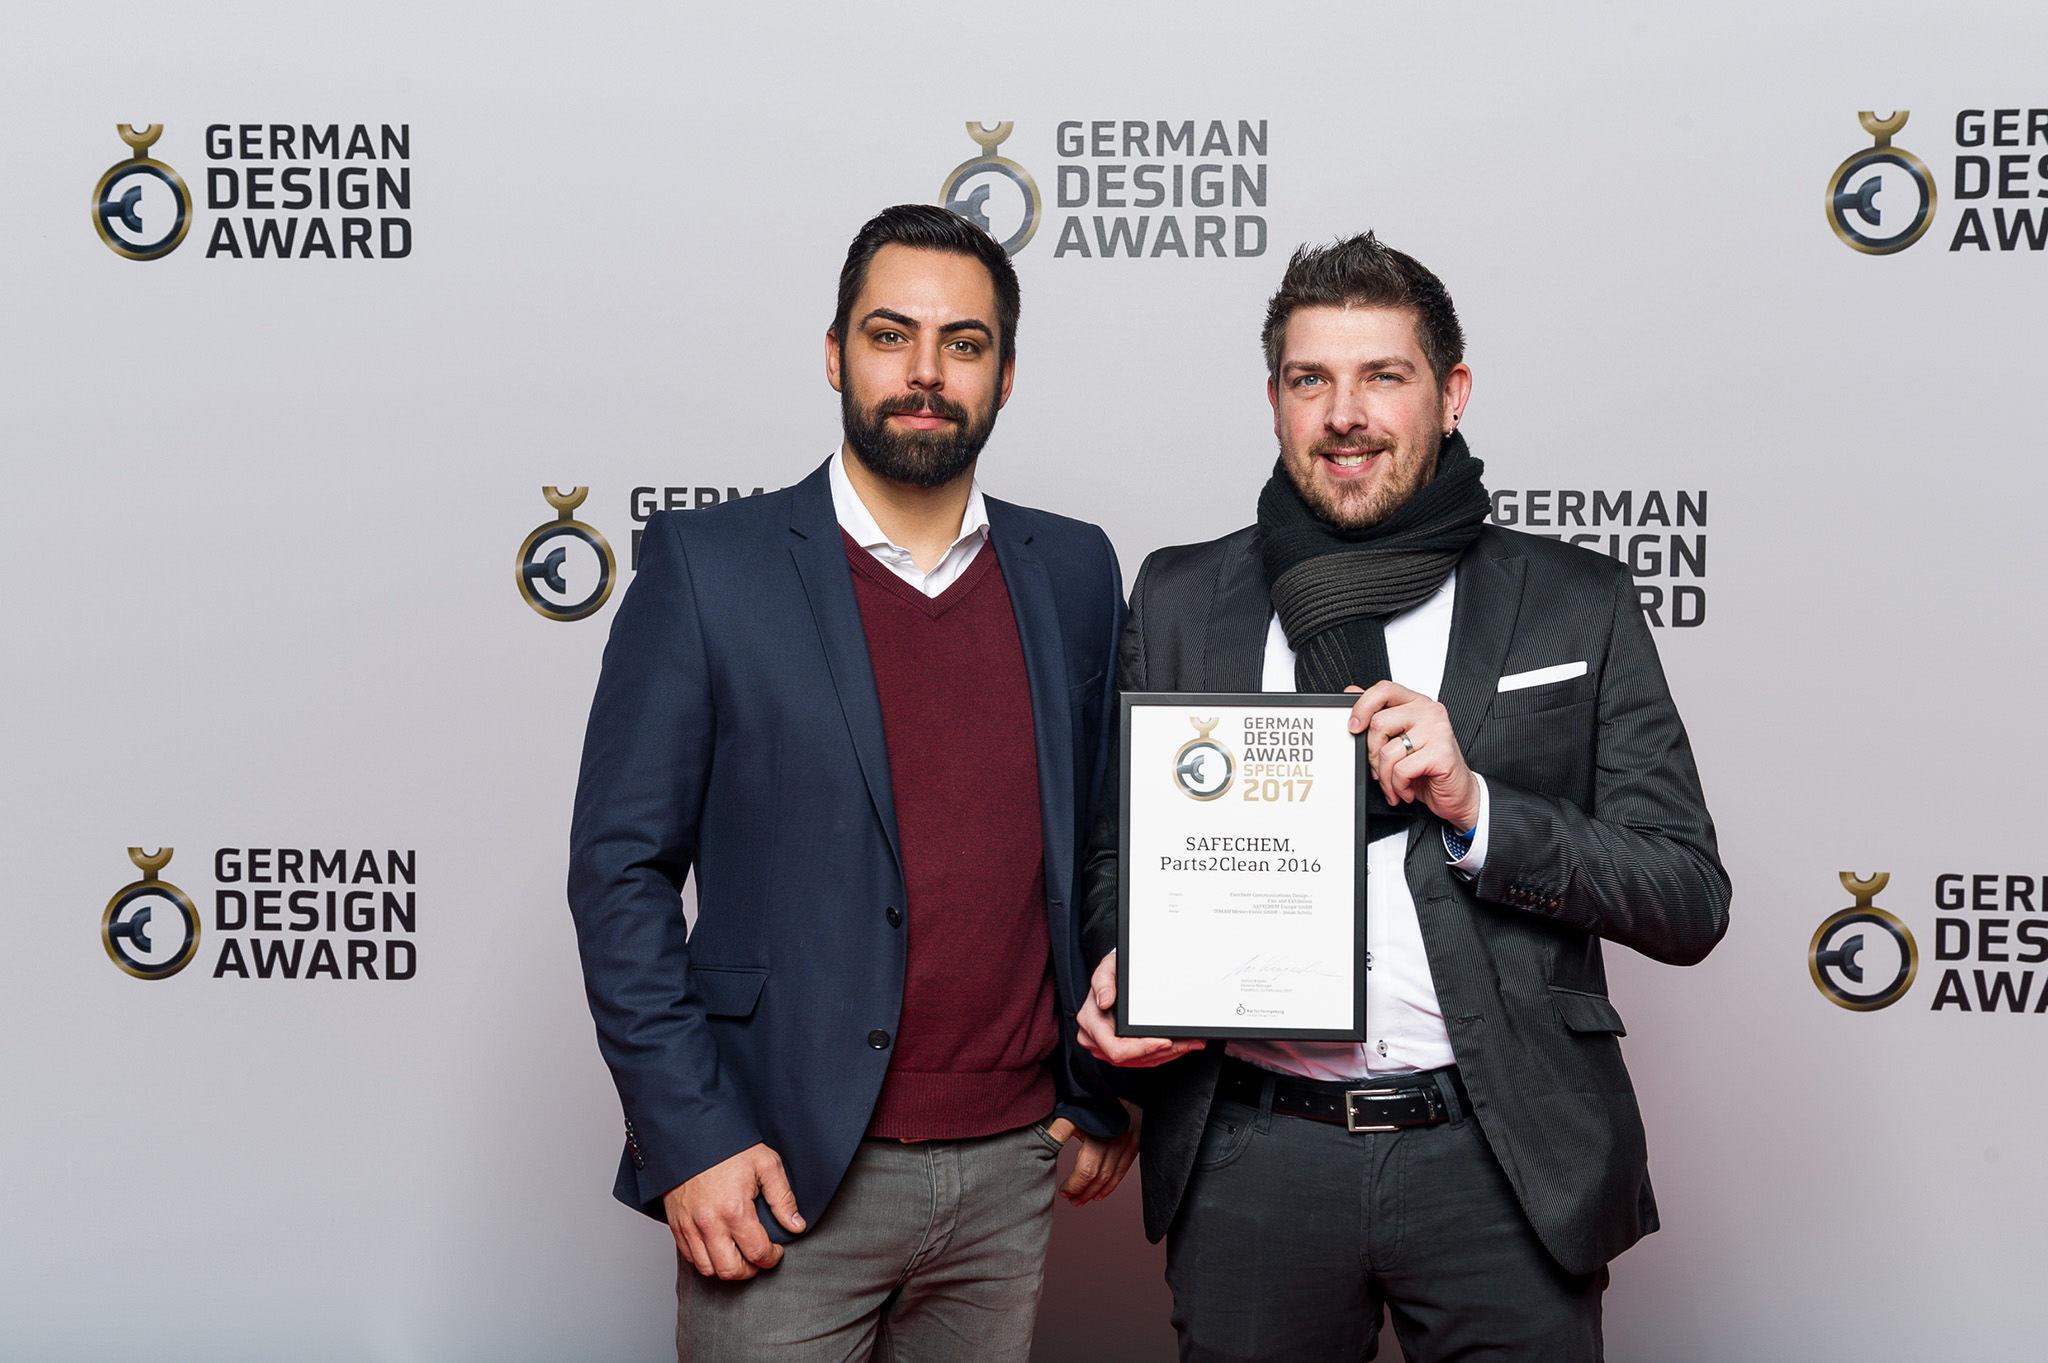 Preisverleihung des German Design Awards –DIMAH Messe + Event